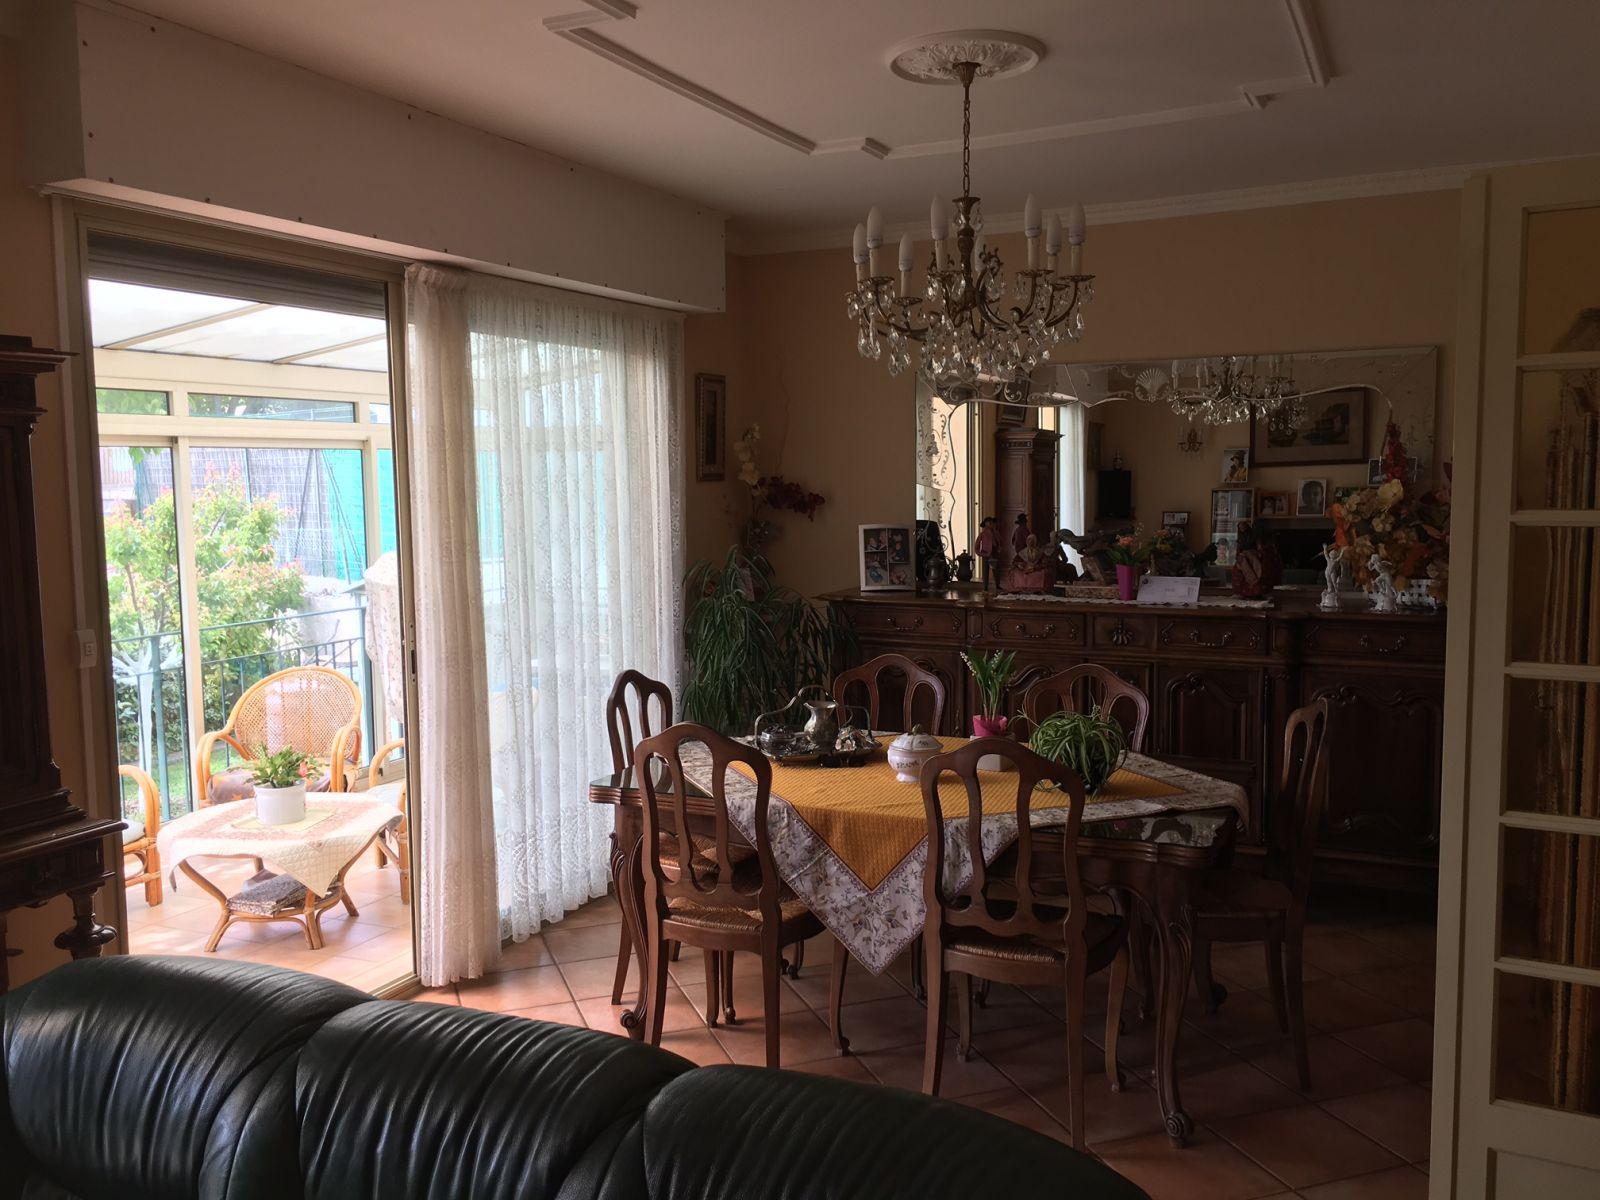 Maison pavillonnaire allauch le colombier viager occupe for Maison allauch